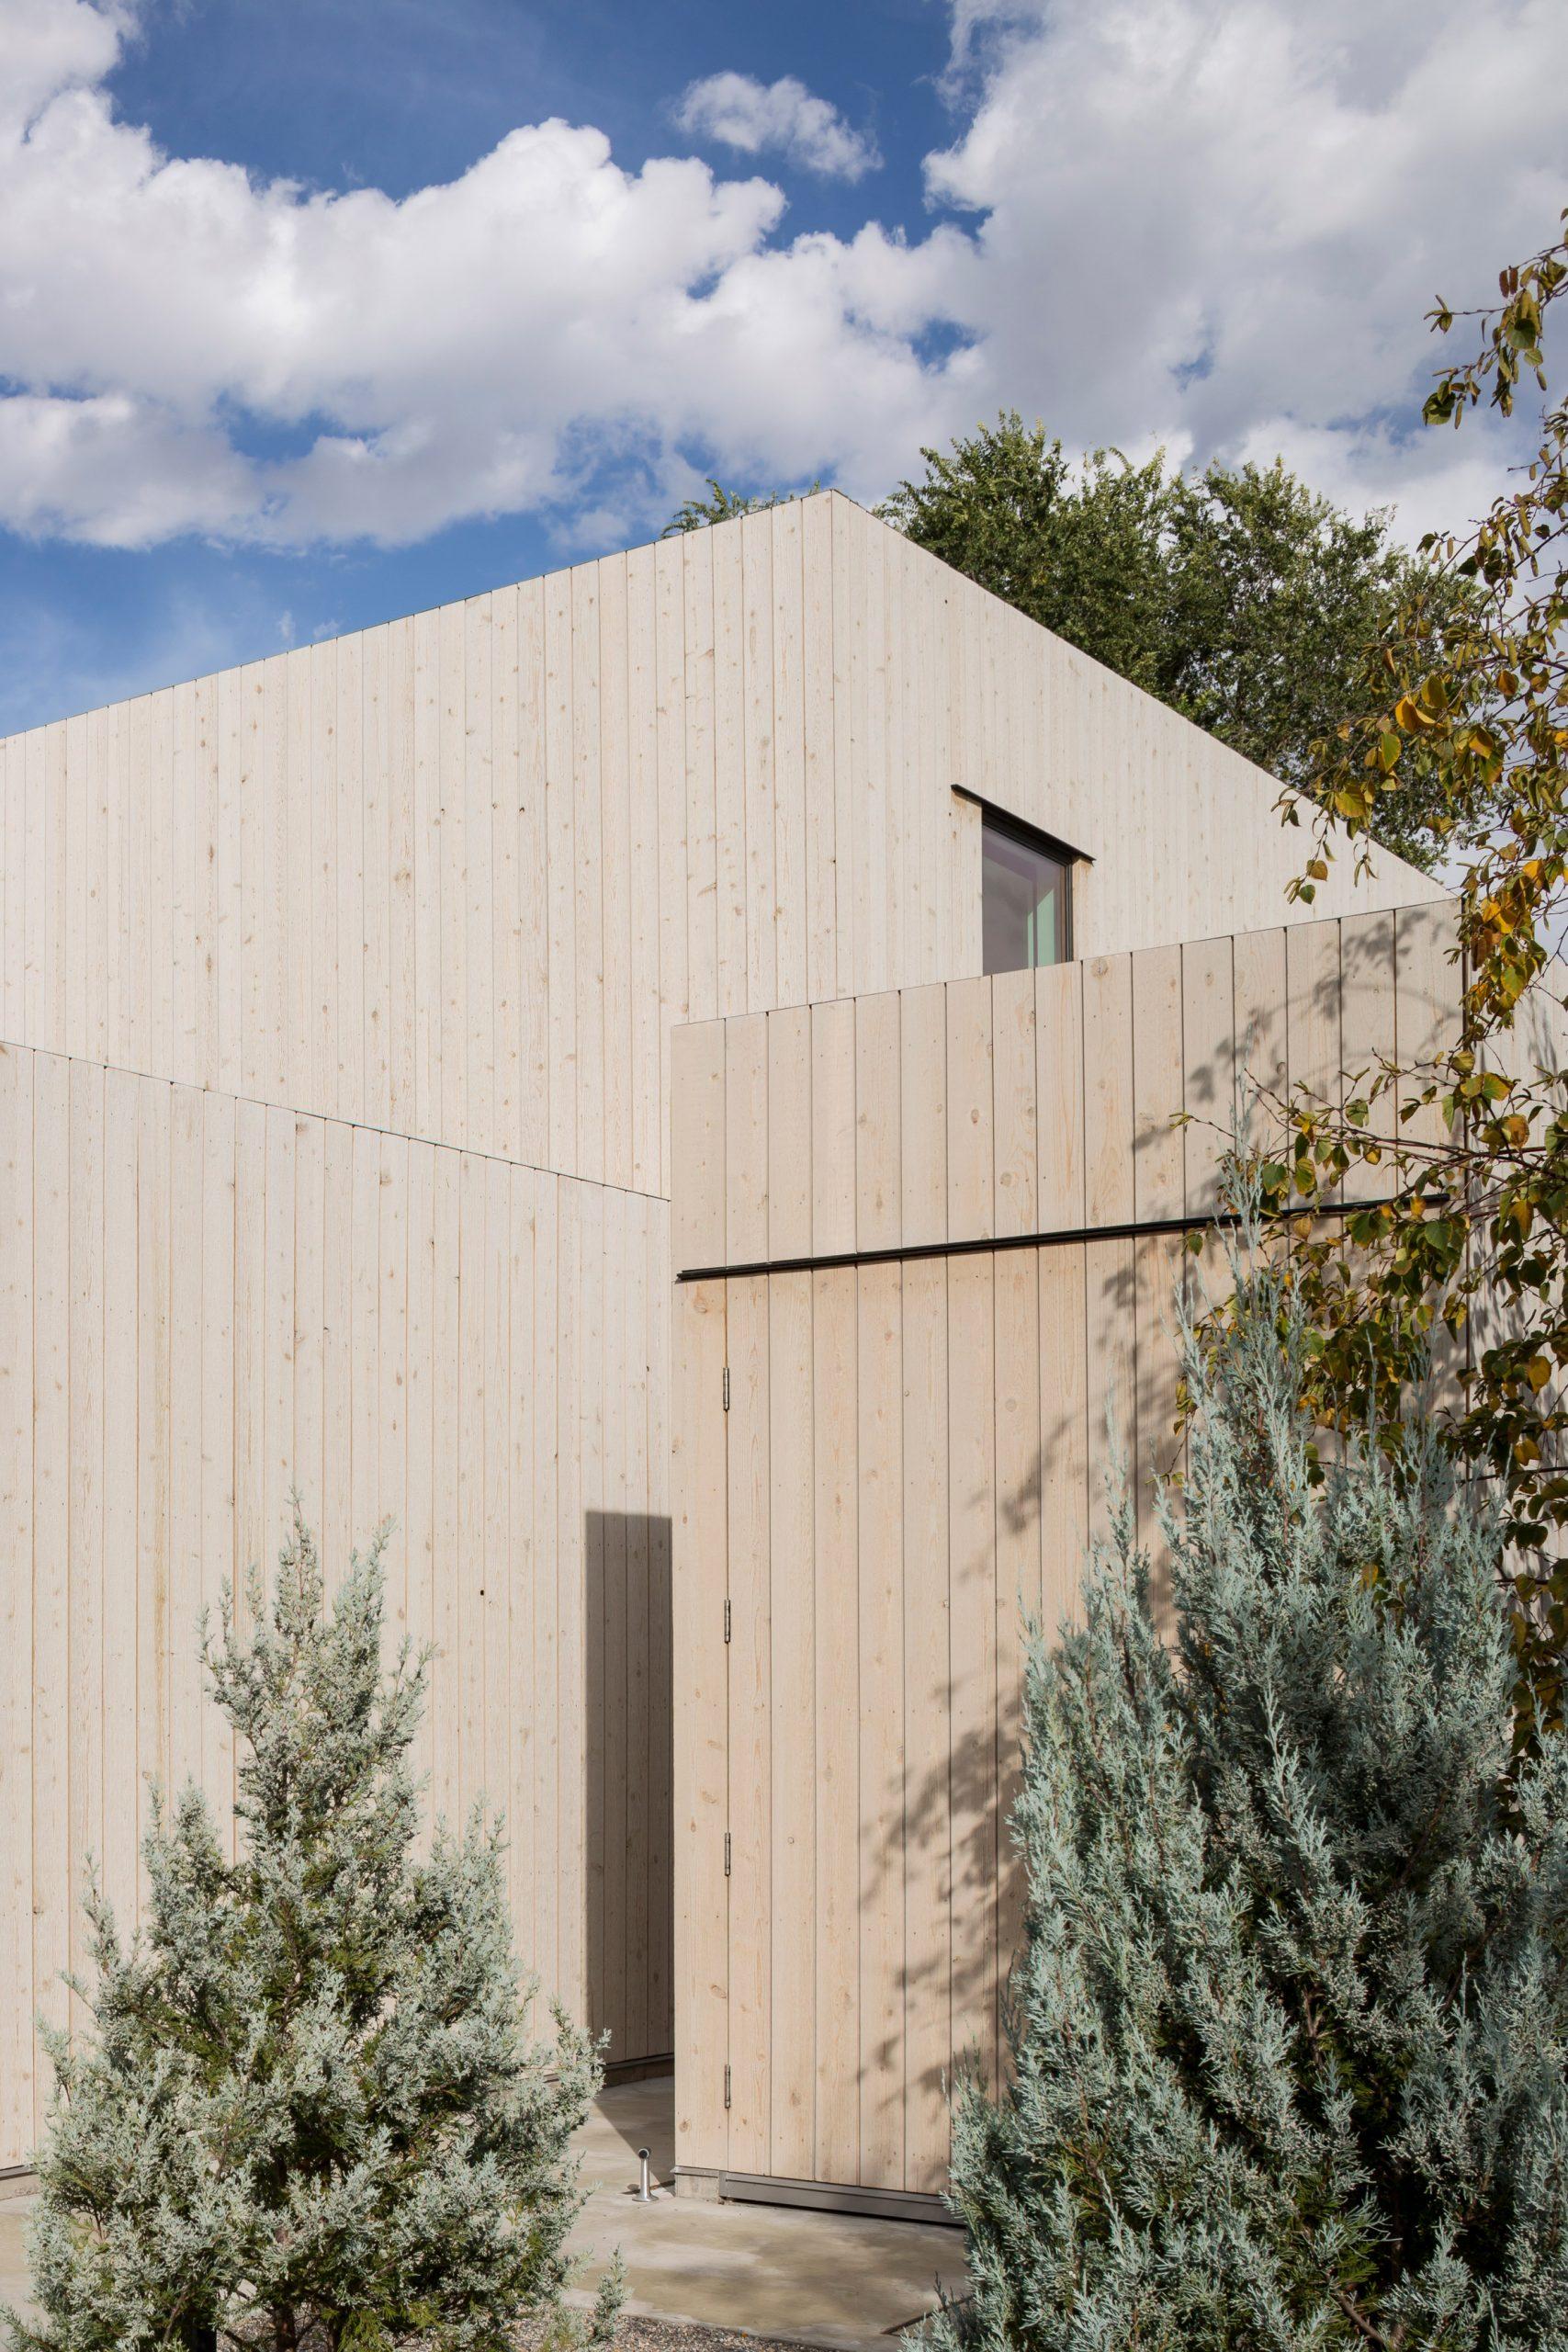 Exterior view of Host House in Utah